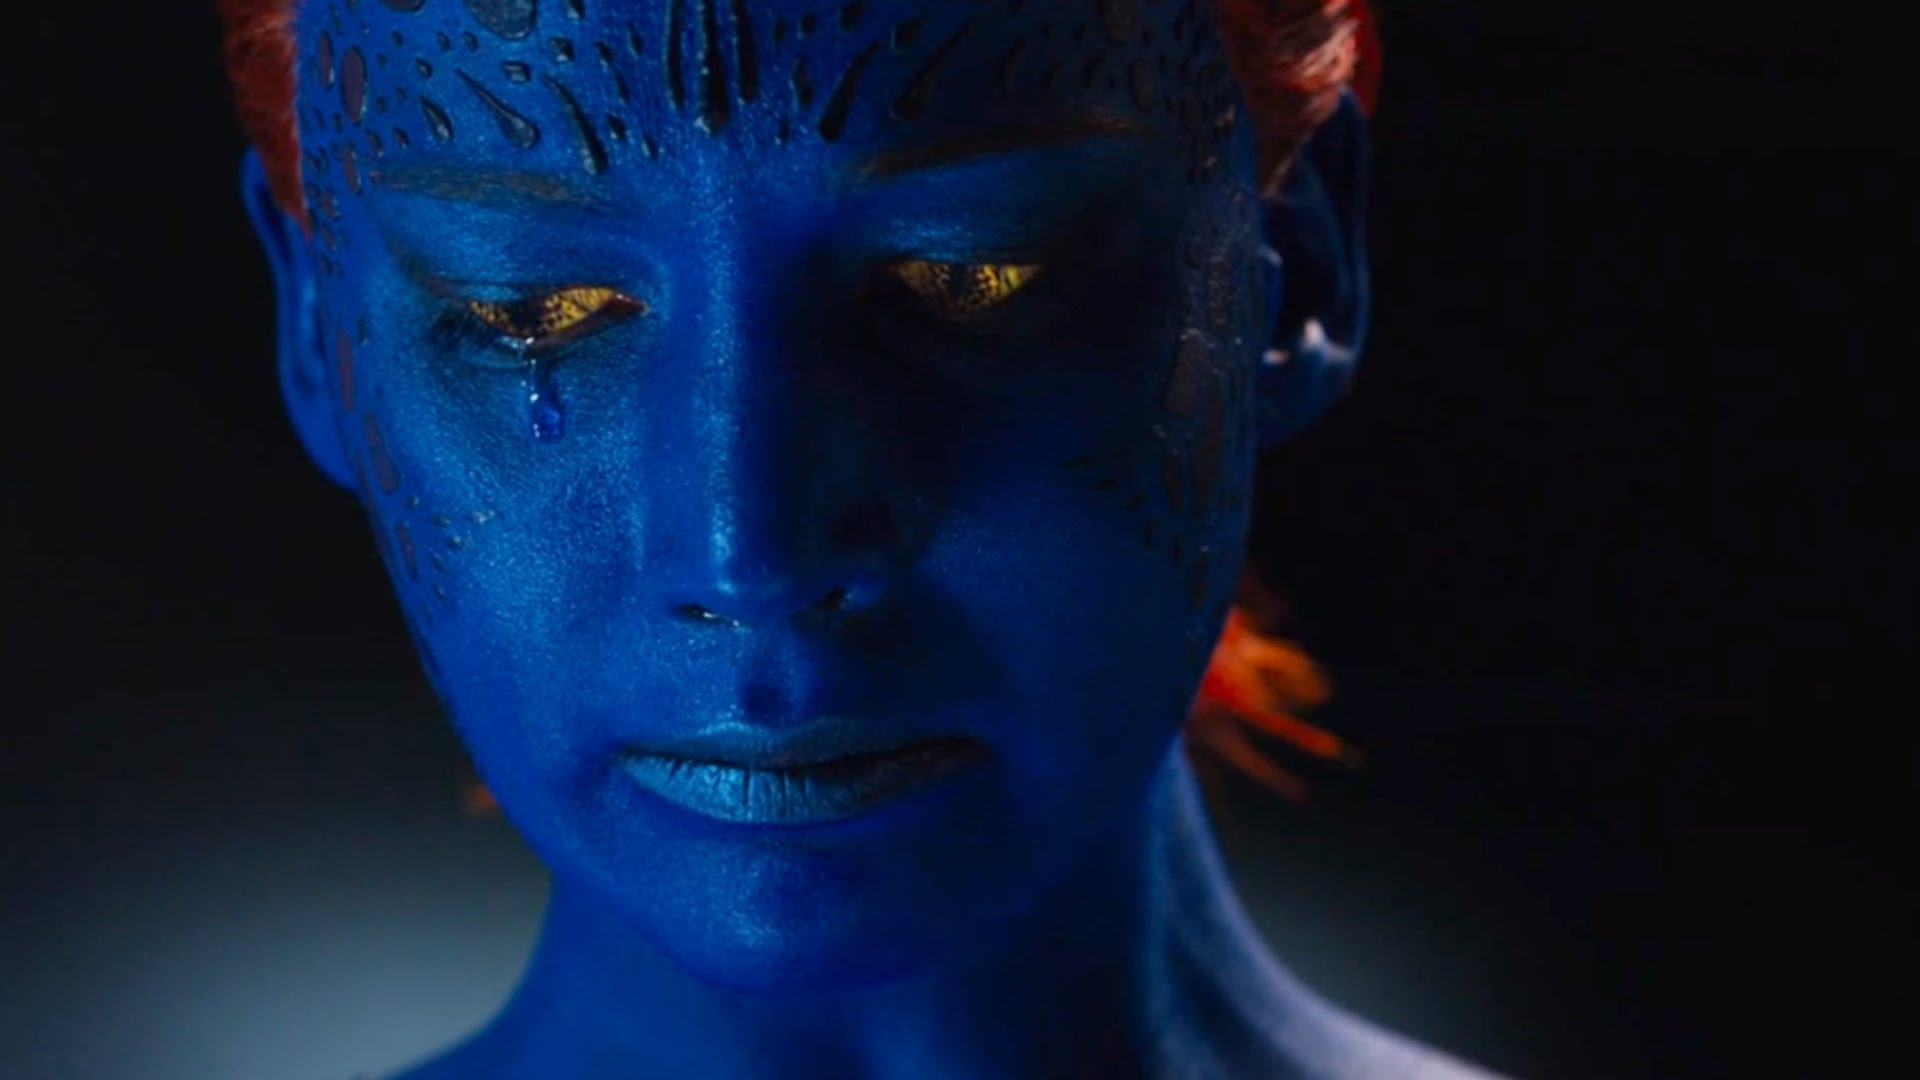 Mystique Jennifer Lawrence Full Body Jennifer Lawrence Will Shed